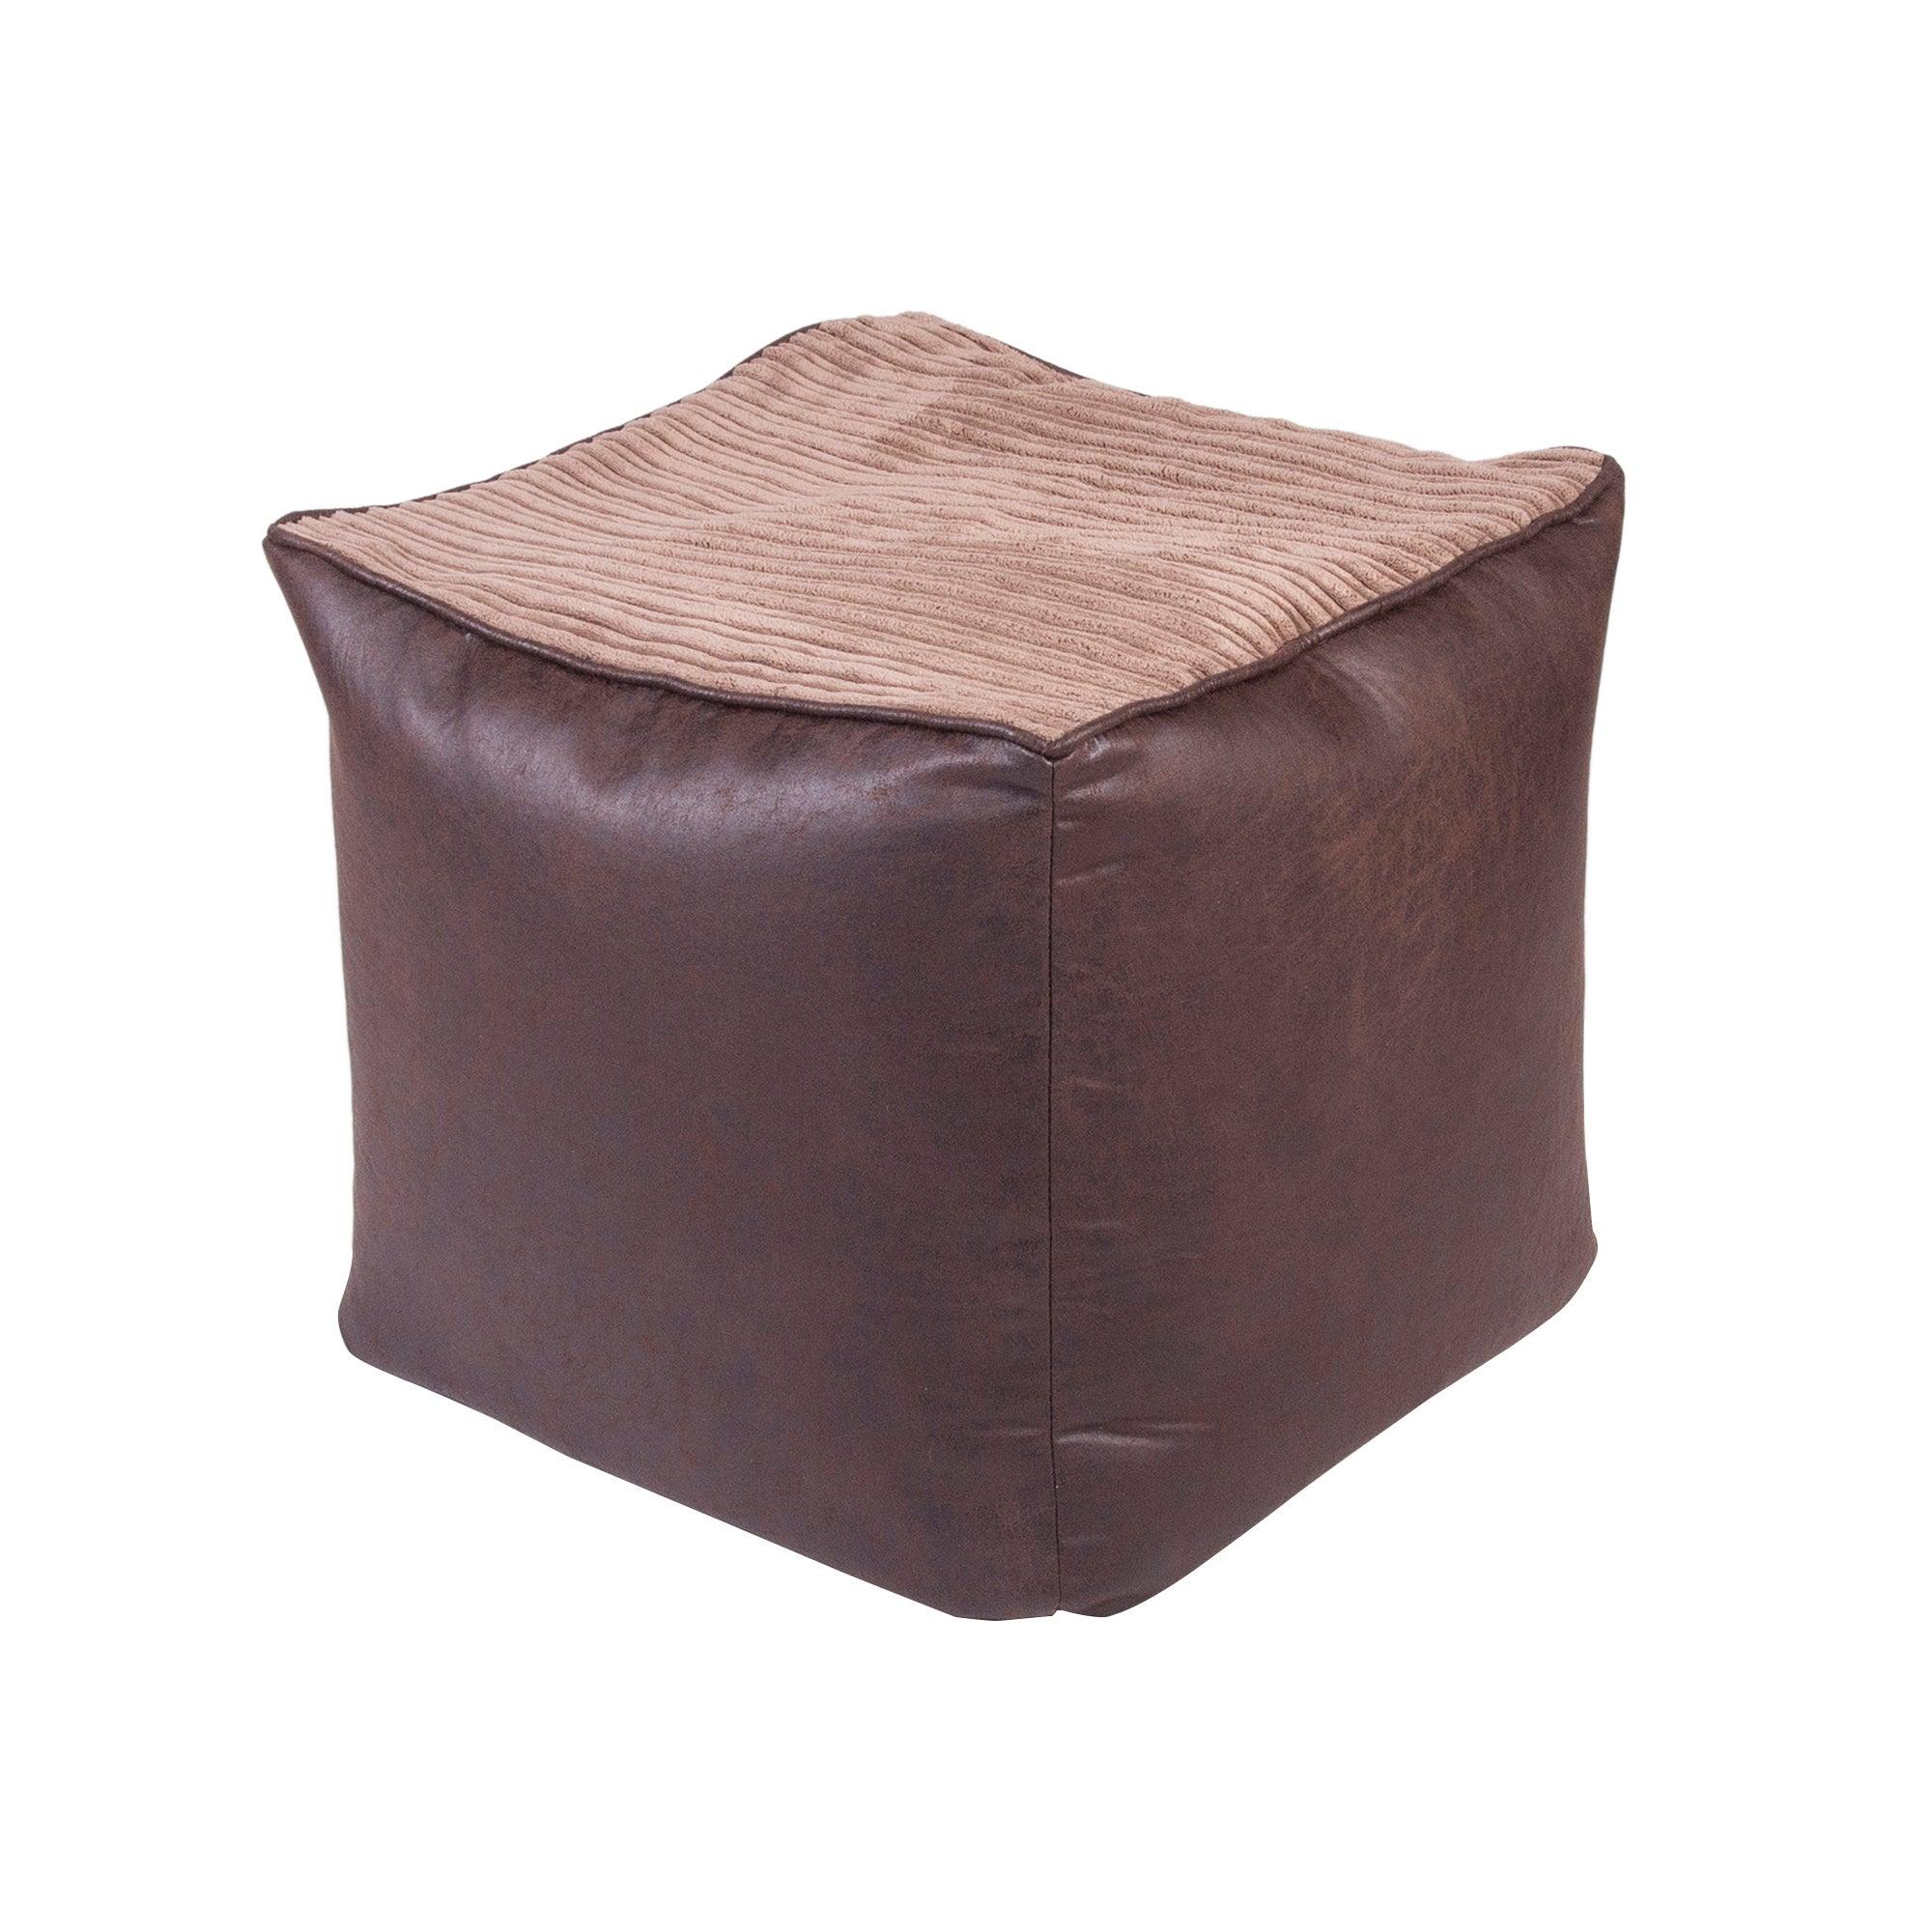 Chocolate Jumbo Cord Bean Cube